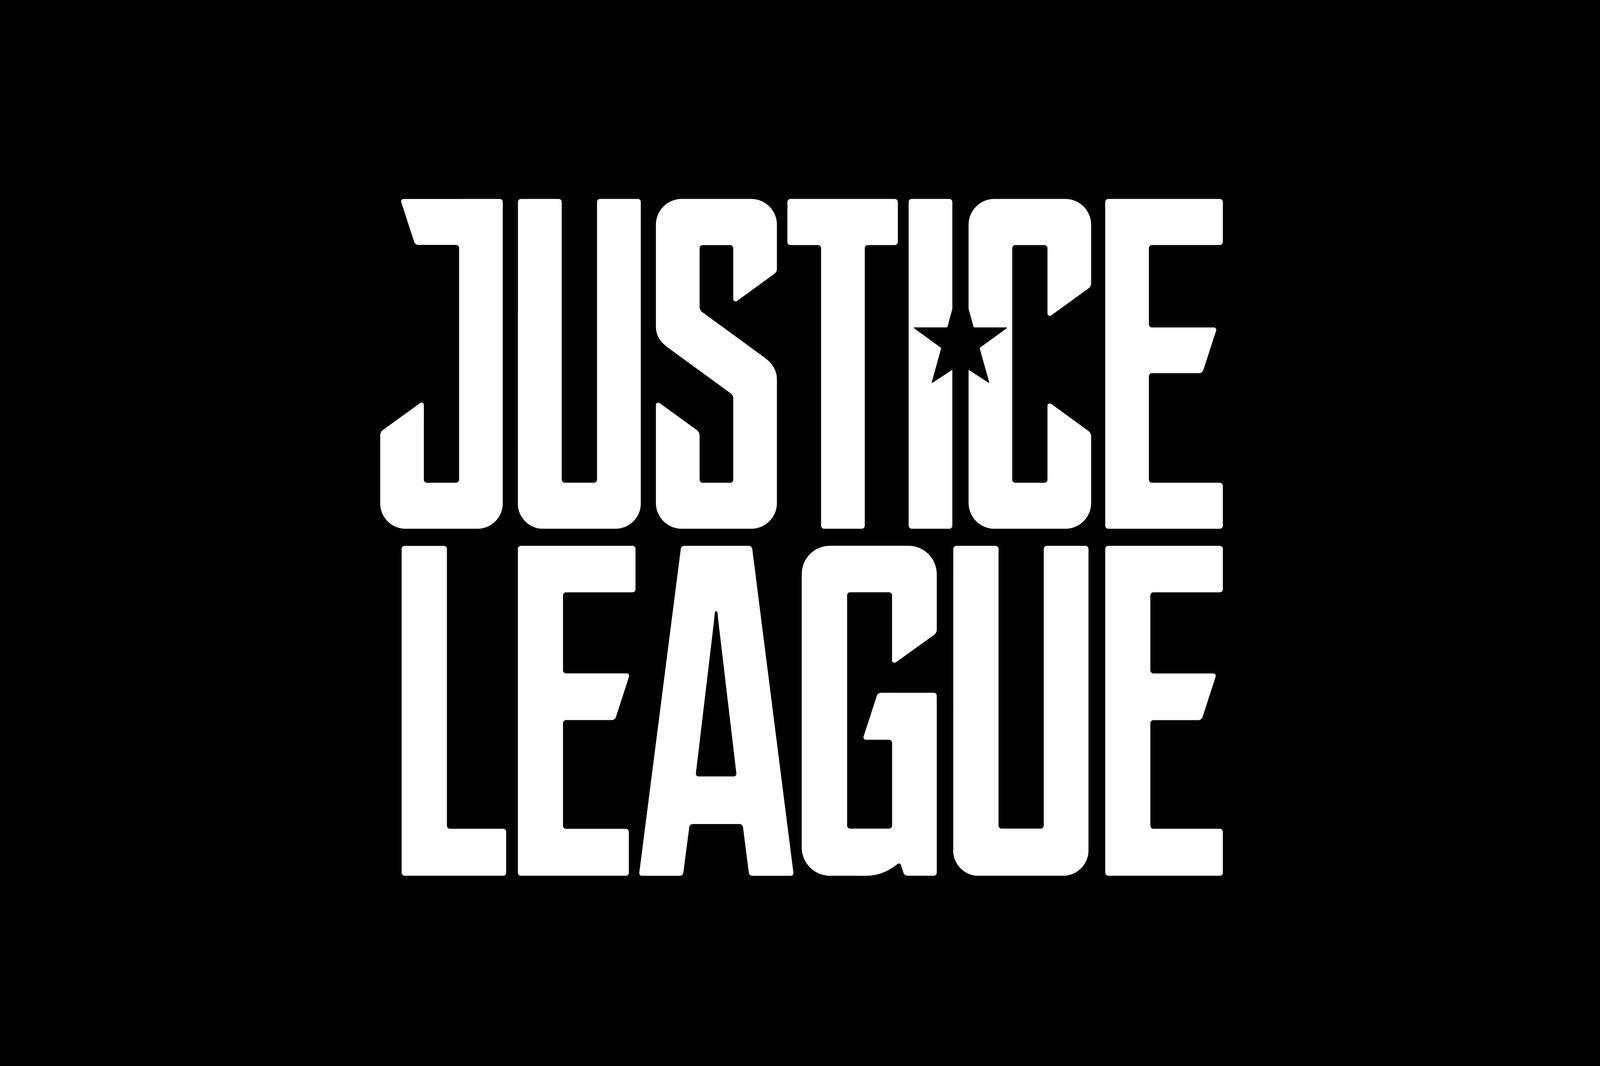 logo negro liga de la justicia